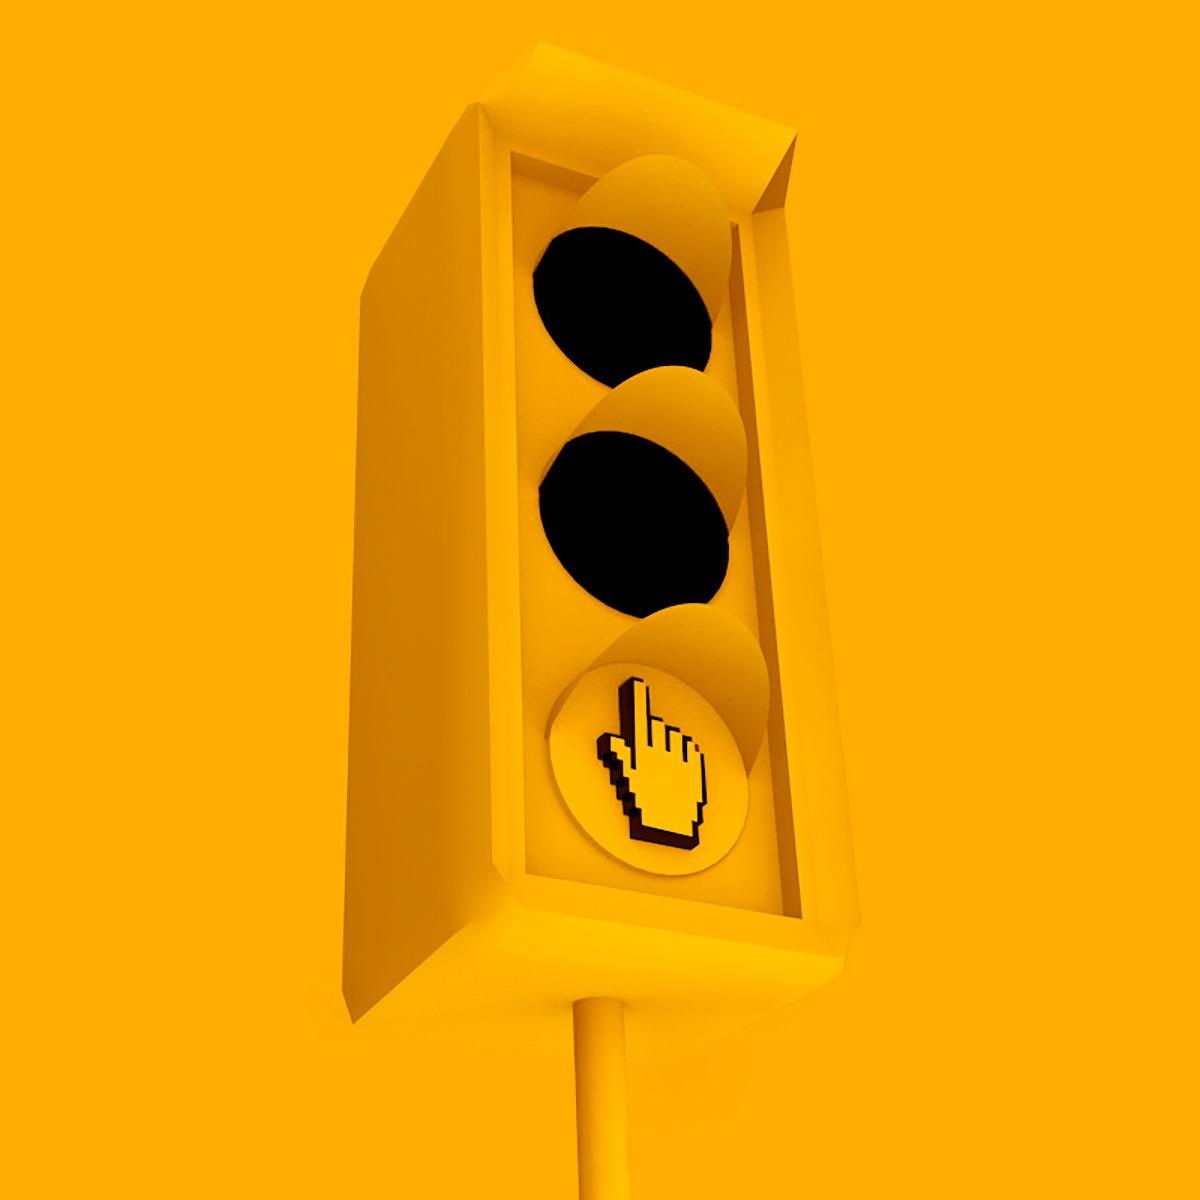 3d footprints and traffic lights